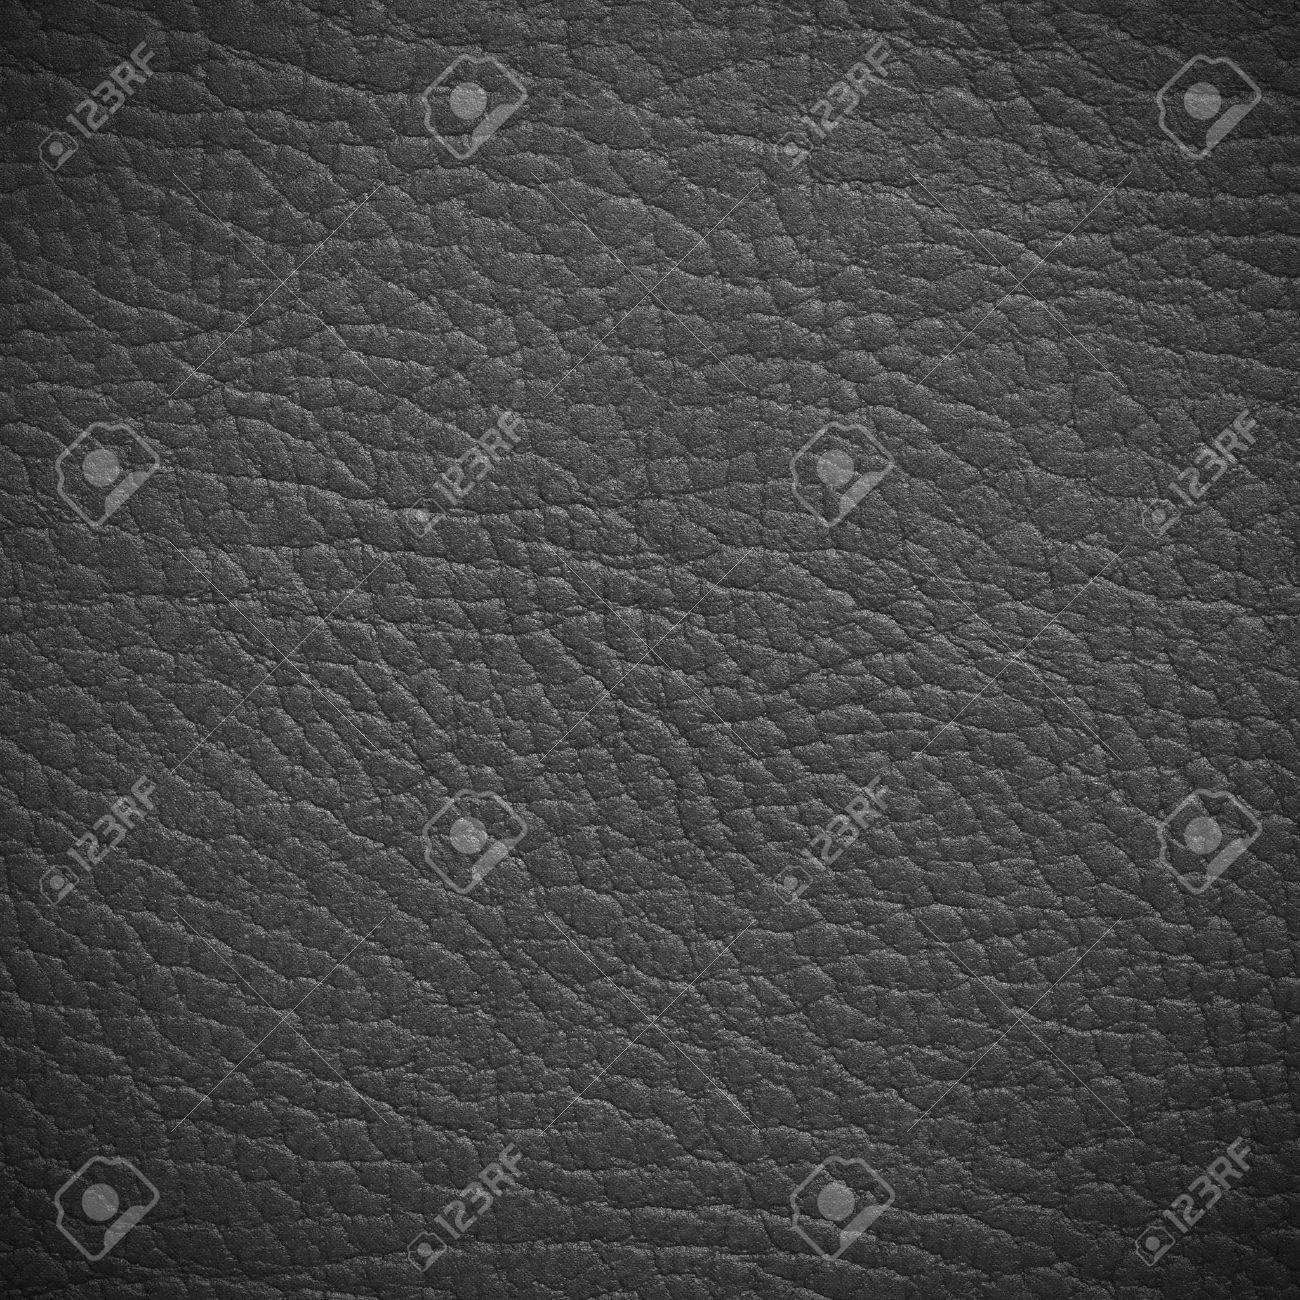 Grey leather texture closeup Standard-Bild - 41699718